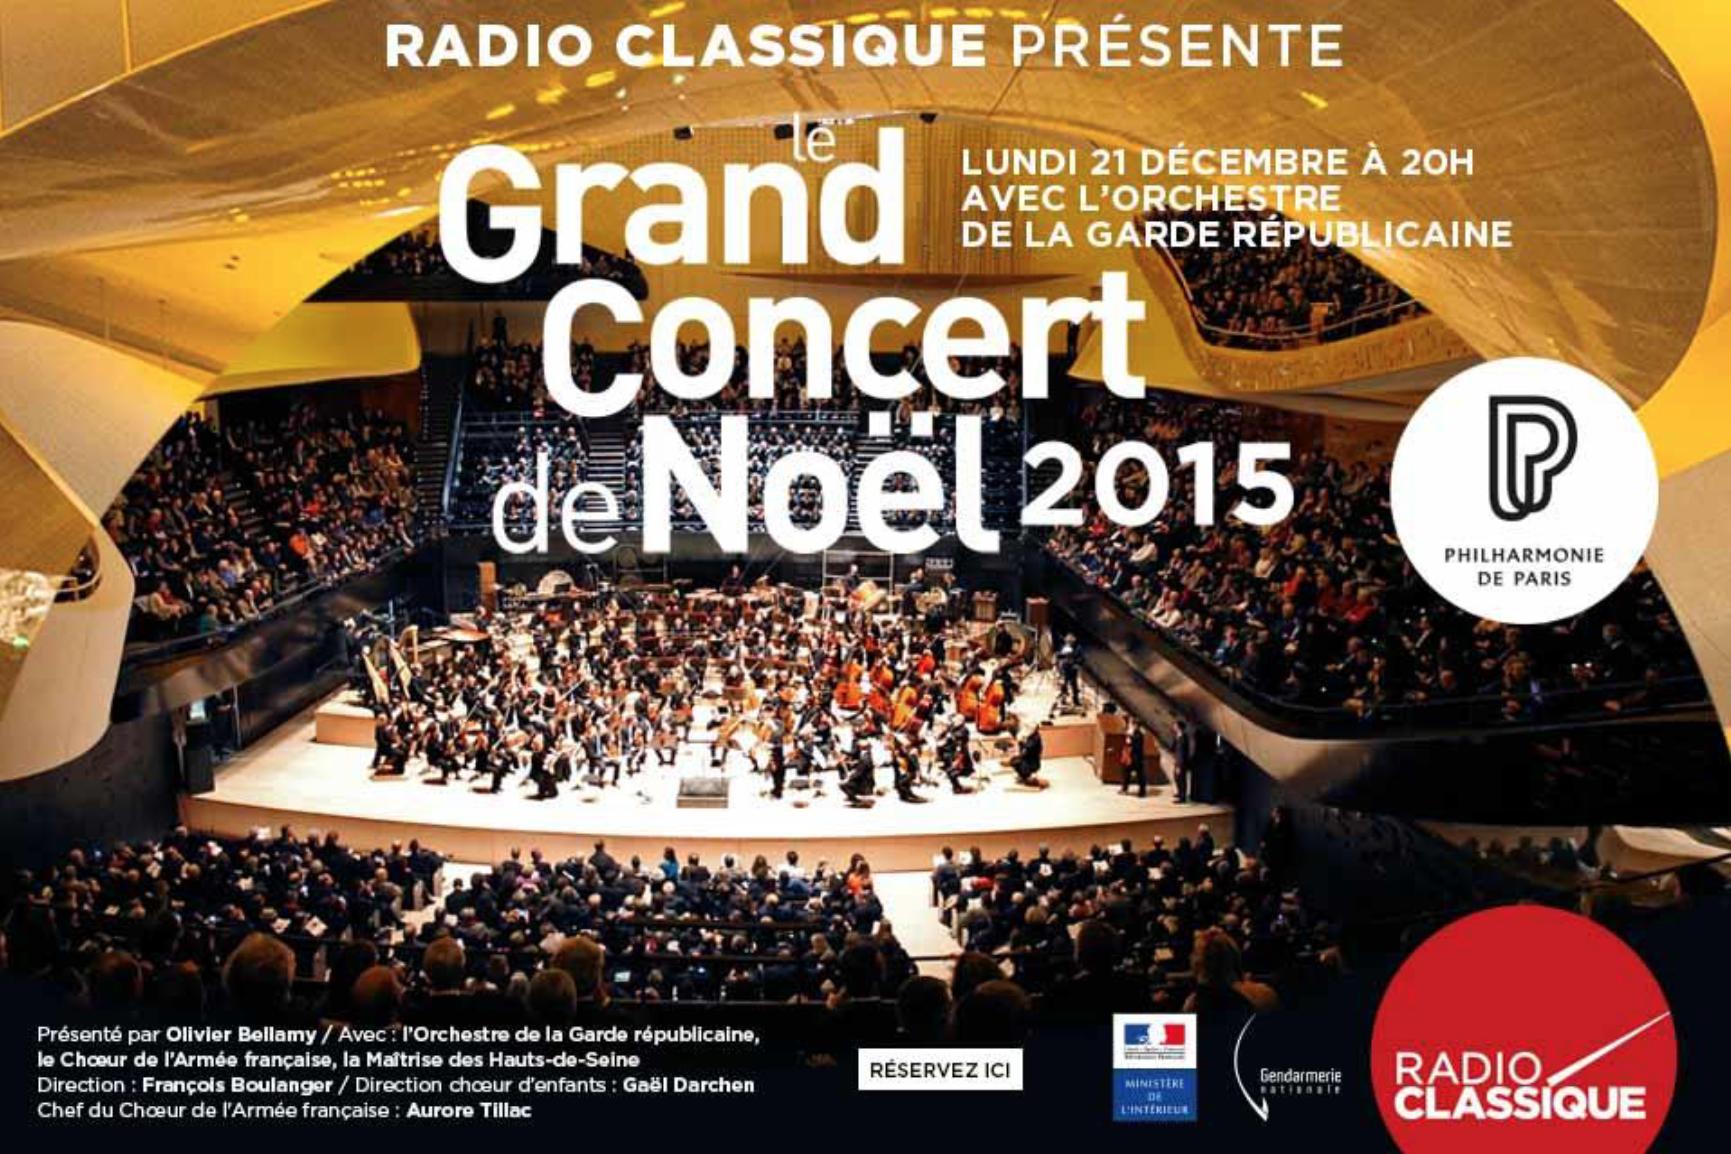 Radio Classique diffuse son Concert de Noël